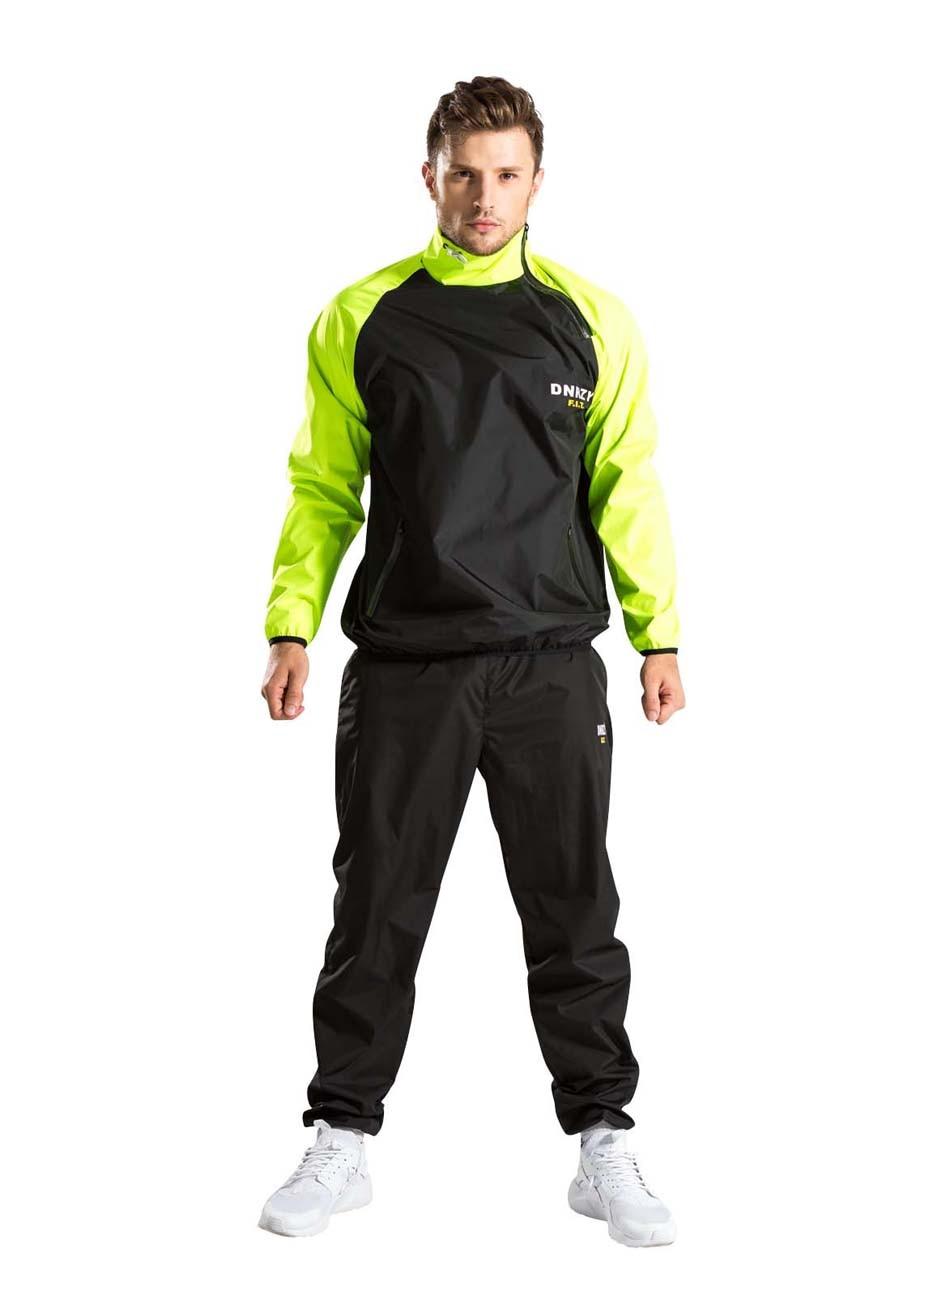 Bonverano Men's Sweat Sauna Suit Lose Weight Black Light Green